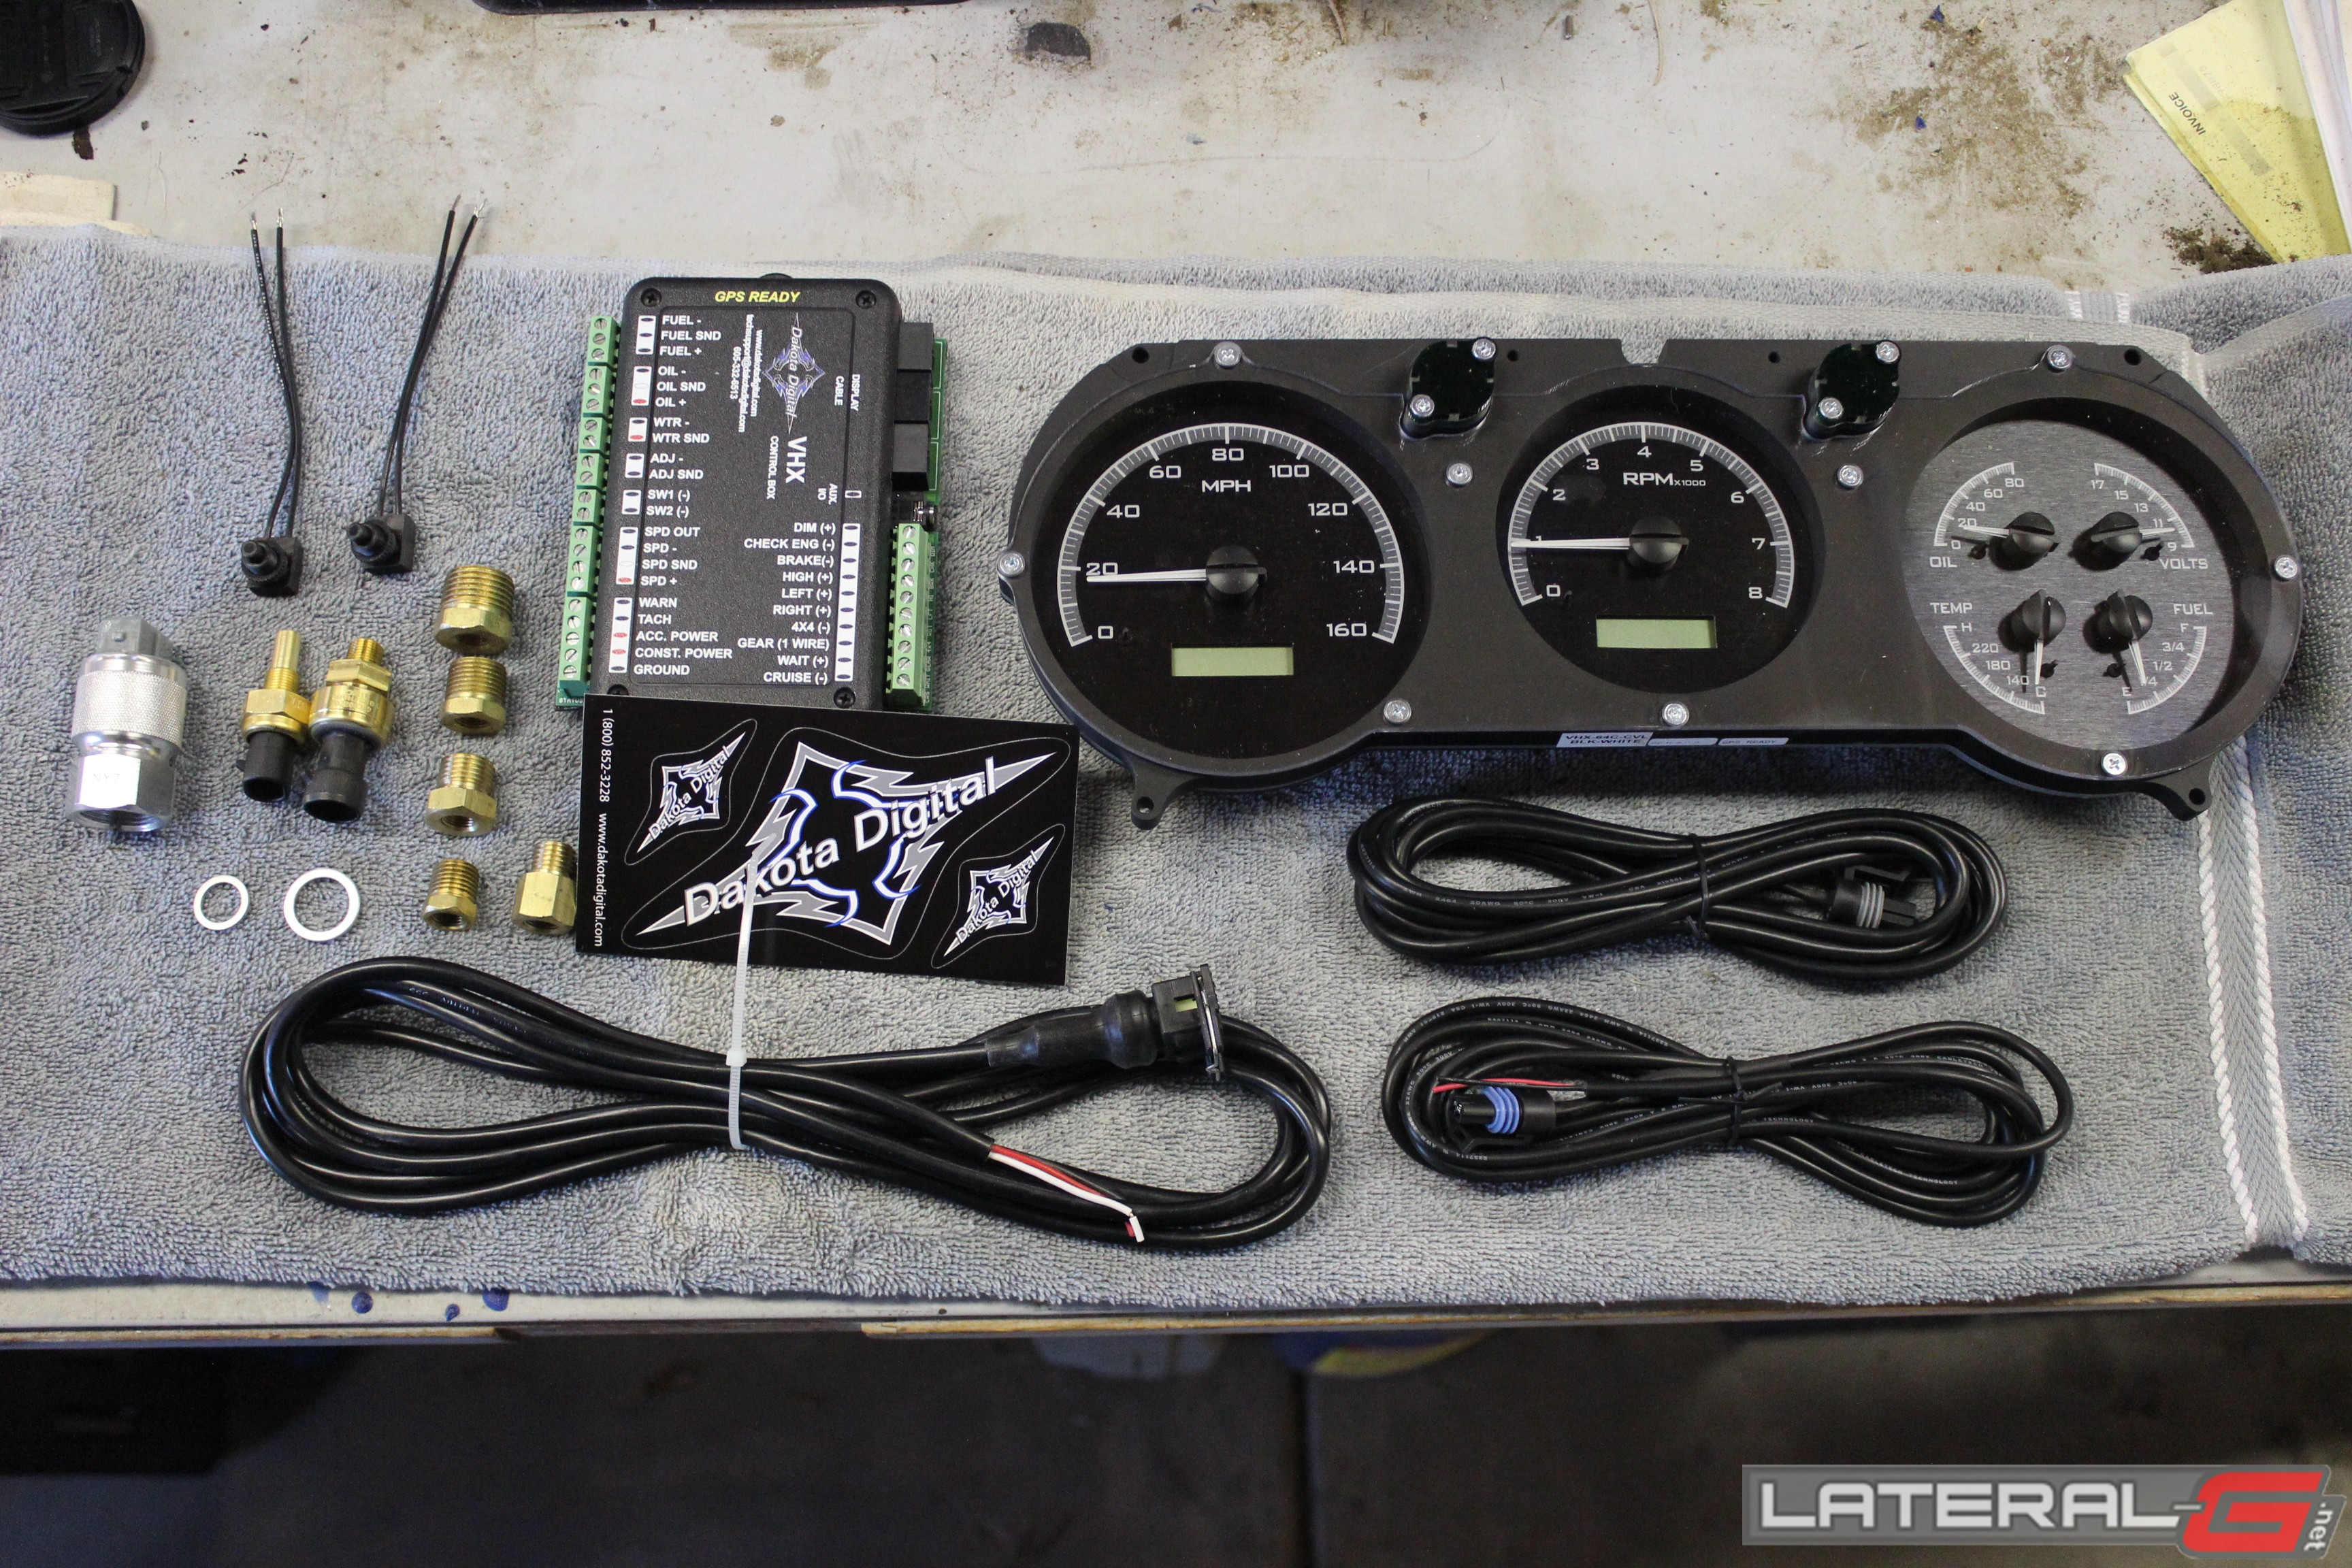 Dakota Digital Fuel Gauge Wiring Trusted Diagrams 1968 Camaro Diagram Vhx Install And Review Chevelle37 Air